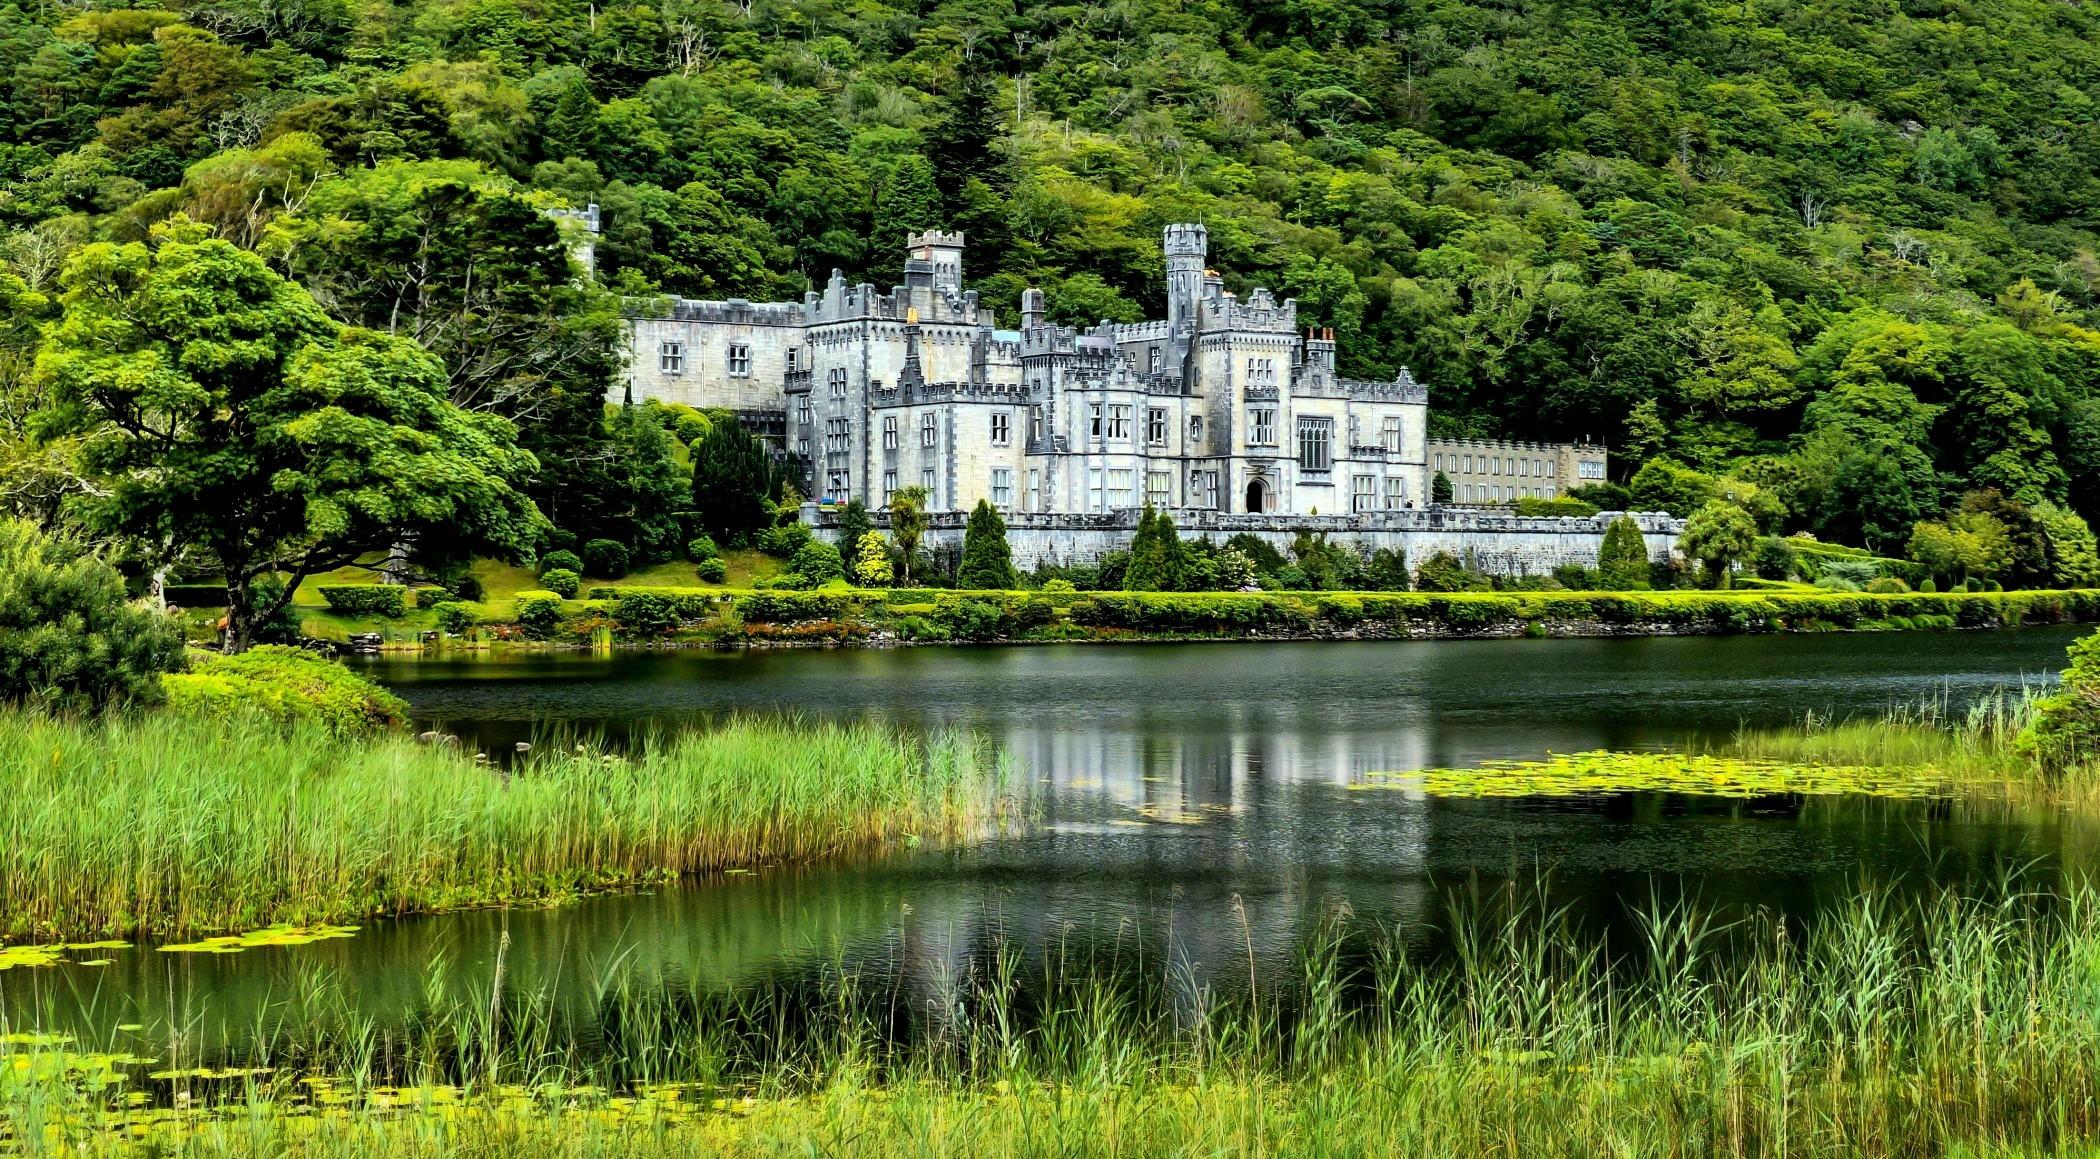 Mainistir na caille moire connemara ireland hd wallpaper - Ireland background wallpaper ...